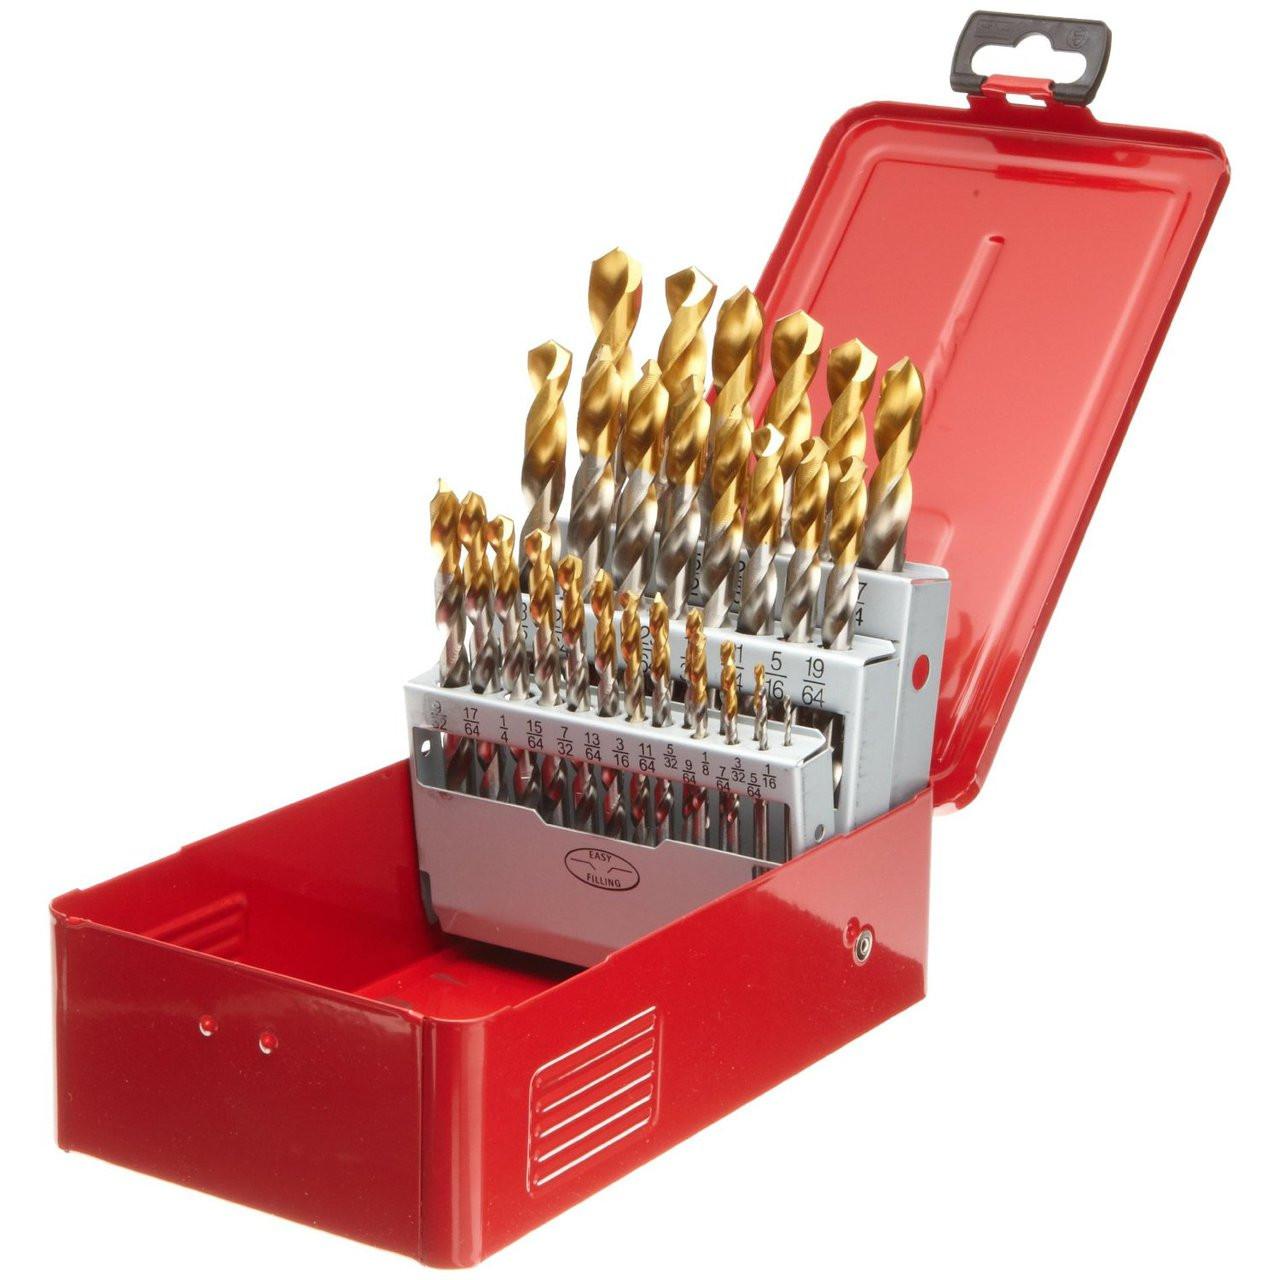 Dormer A097 18 29pc Sae Drill Bit Set 1 16 To 1 2 X 1 64